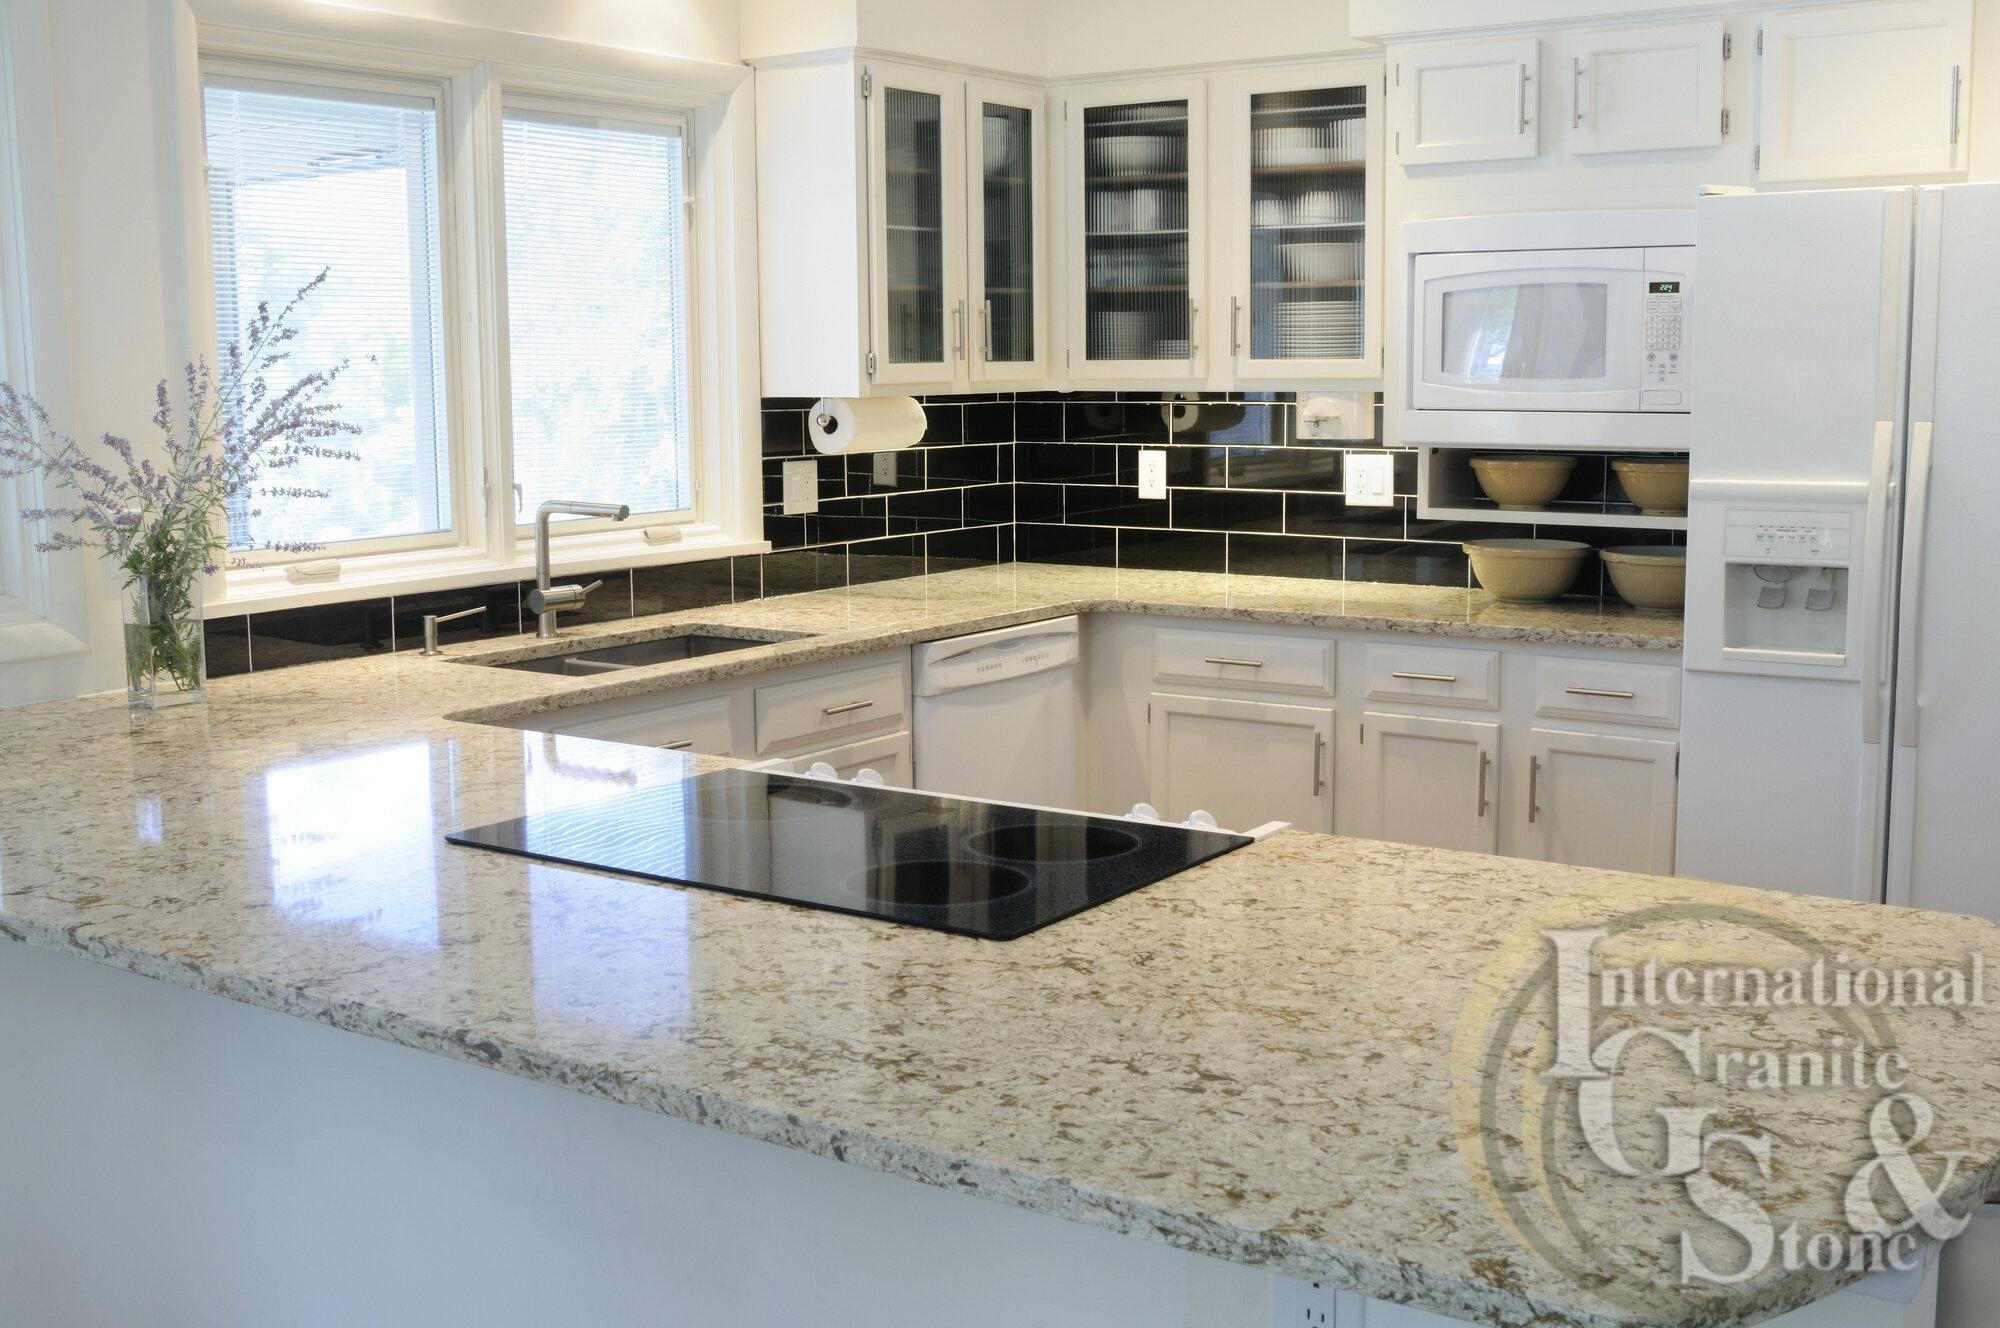 Cost Of Your Quartz Countertops